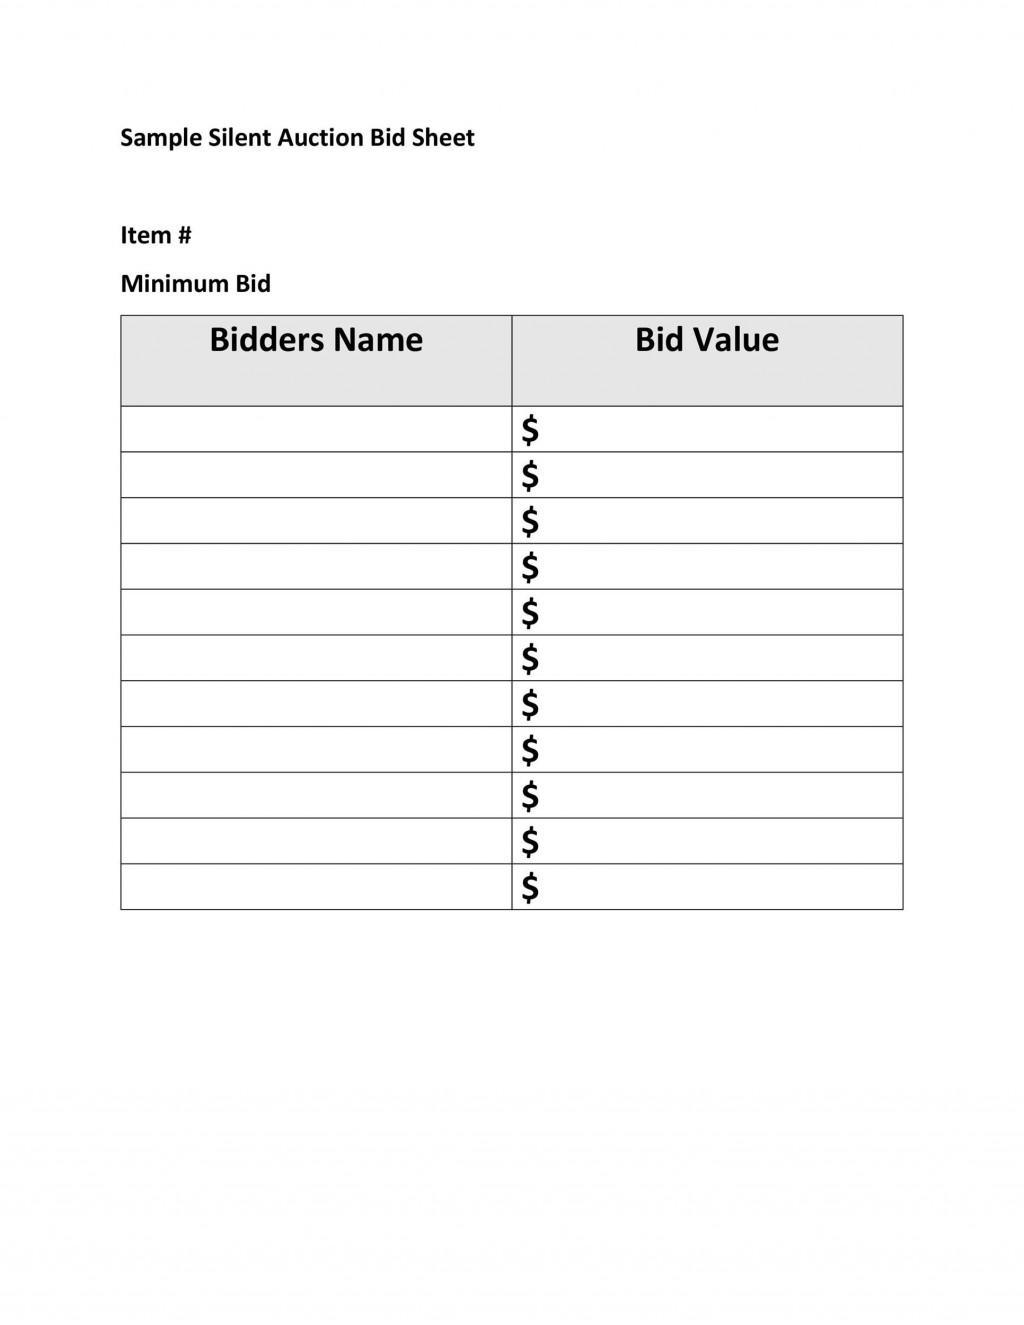 005 Unique Sample Silent Auction Bid Sheet Free  Printable Template DownloadLarge